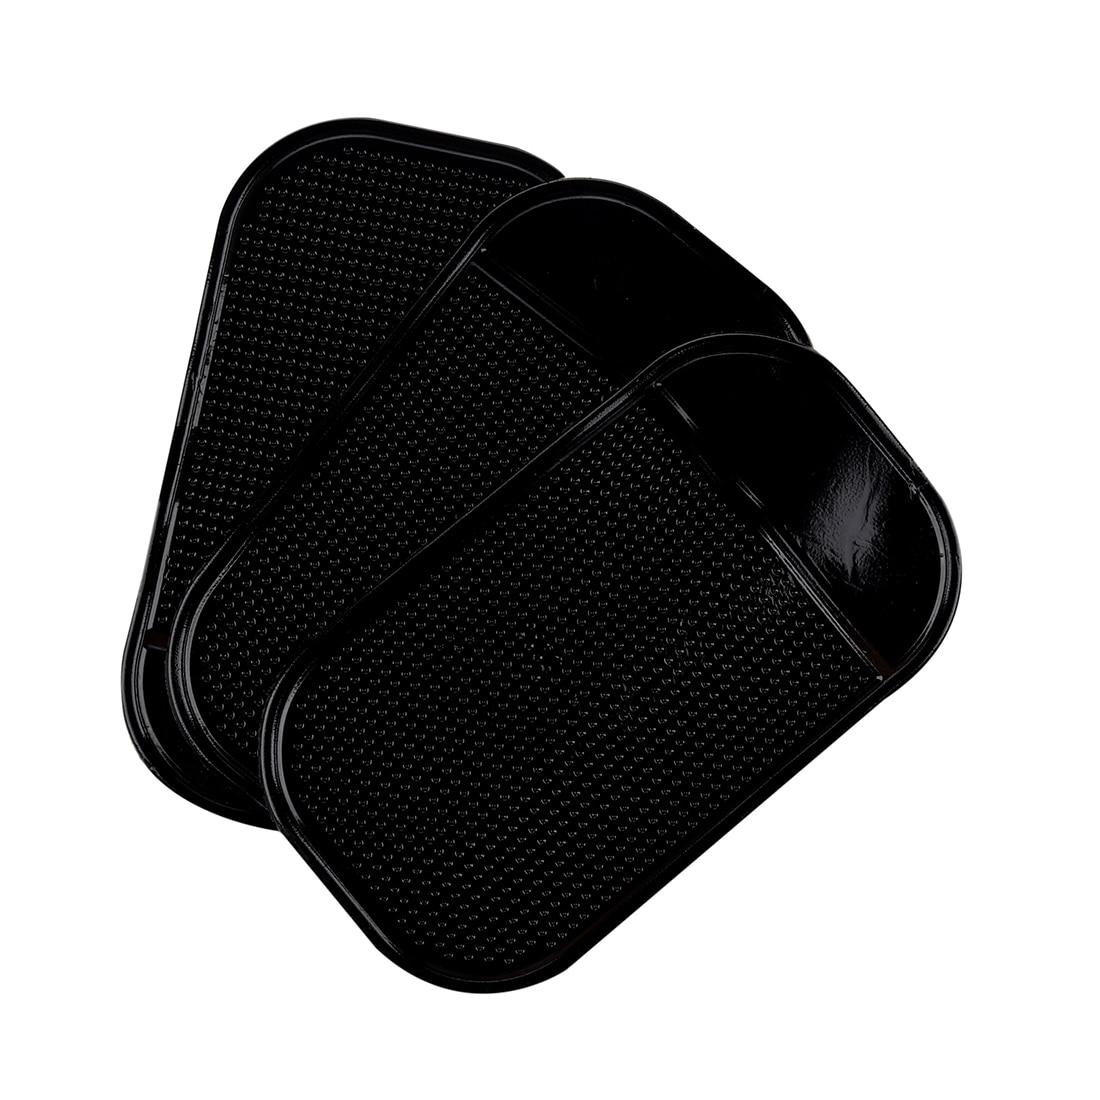 auto 3 tapis autocollant voiture antiderapant non slip. Black Bedroom Furniture Sets. Home Design Ideas